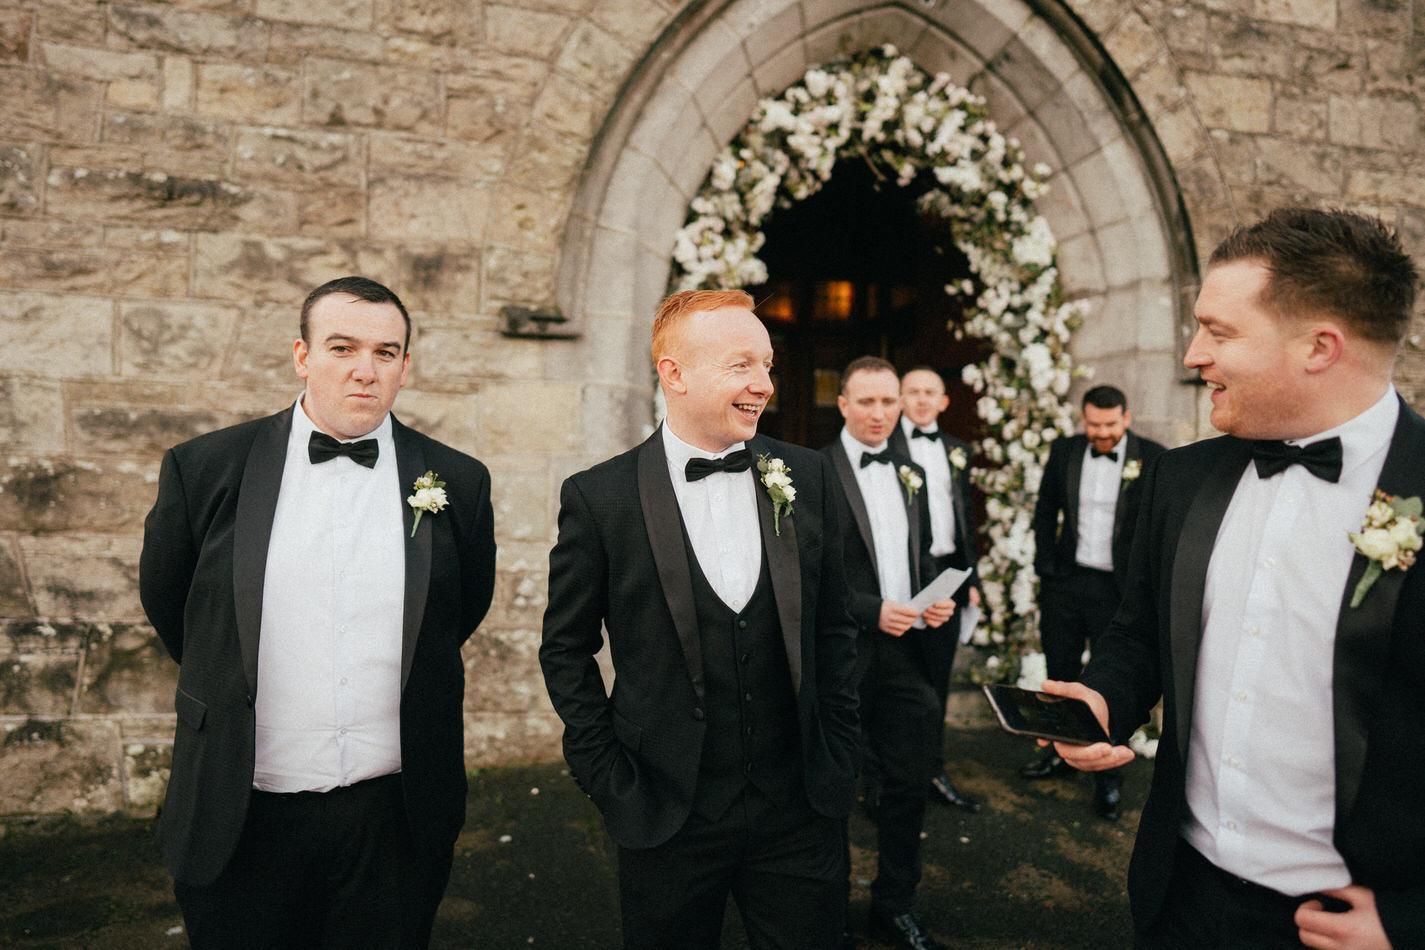 Castle-wedding-ireland-photos- 0092 62